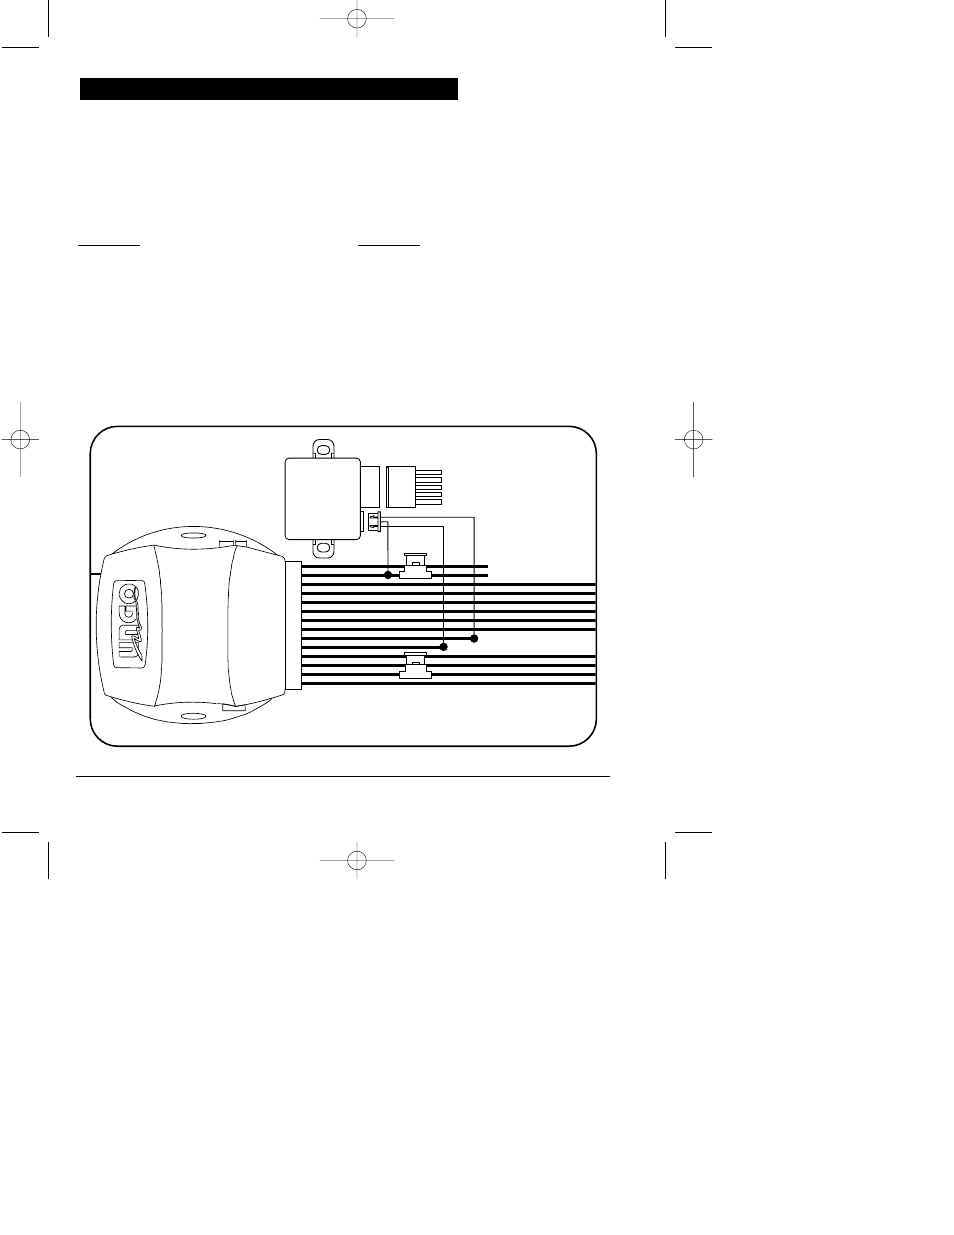 Ungo Car Alarm Wiring Diagram Trusted Diagrams Optional Dlrm Door Lock Relay Module Clarion Ms3001 User K9